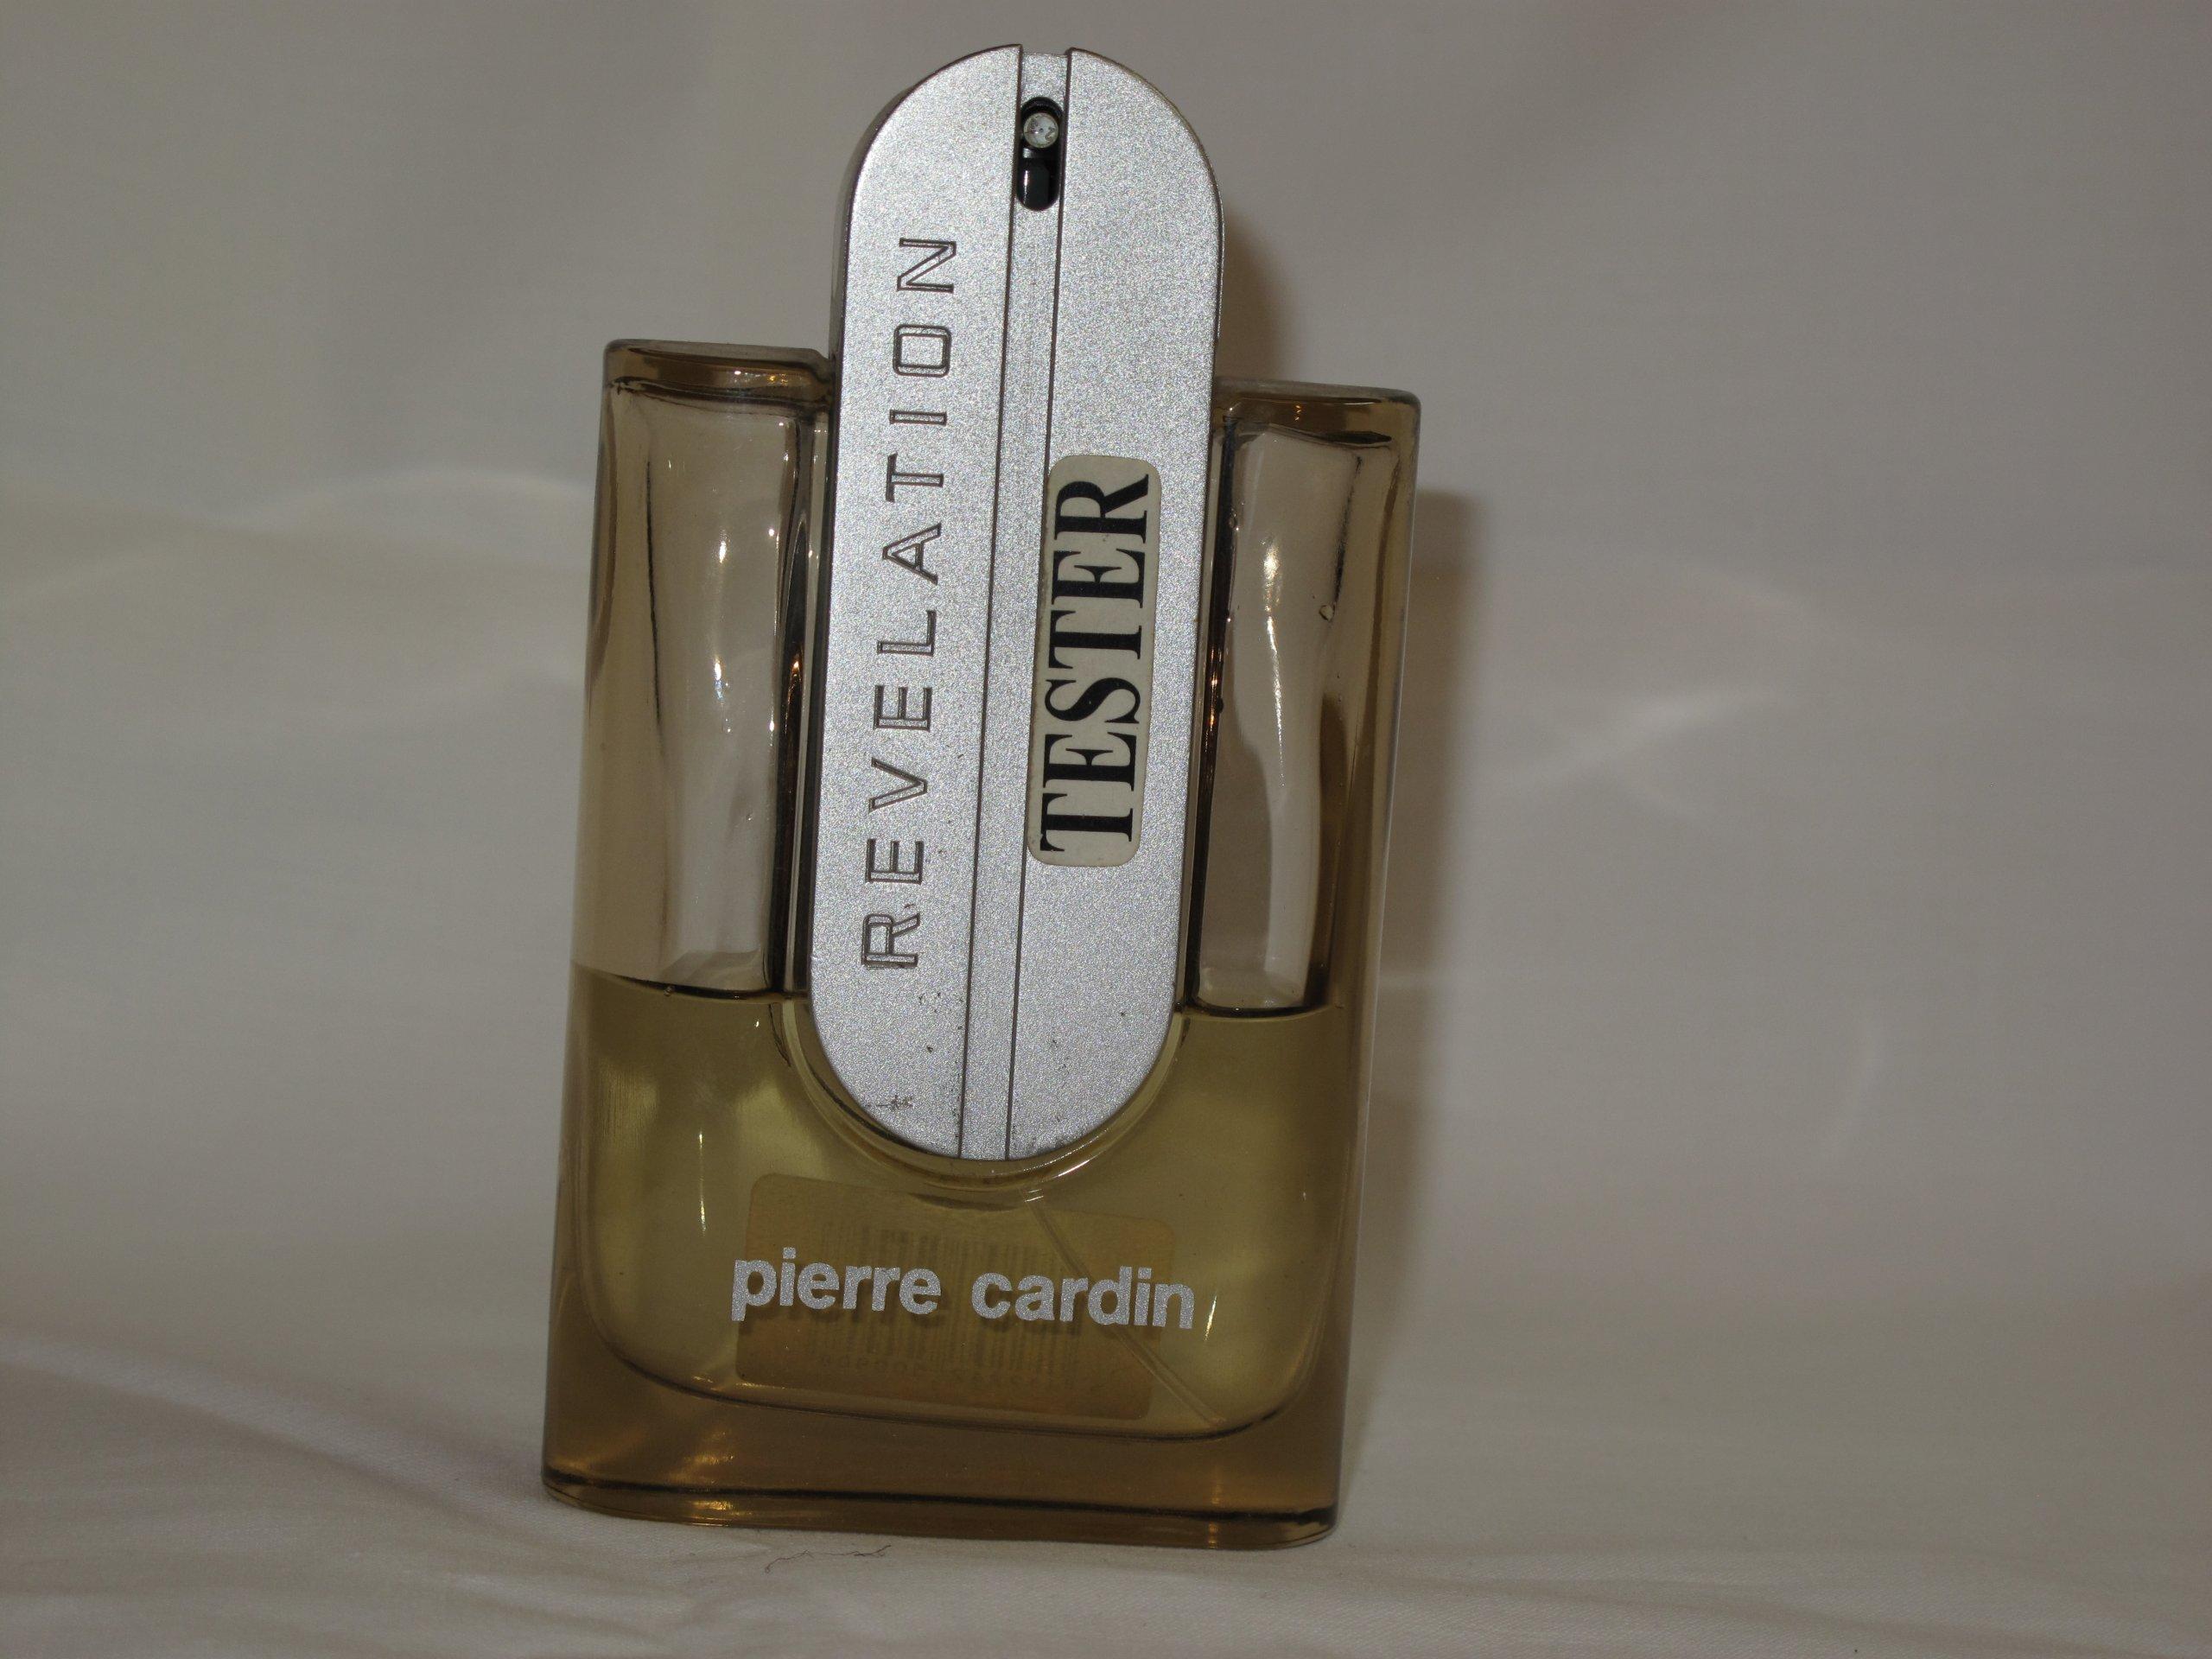 PIERRE CARDIN REVELATION woda toaletowa 75ml 7068300898